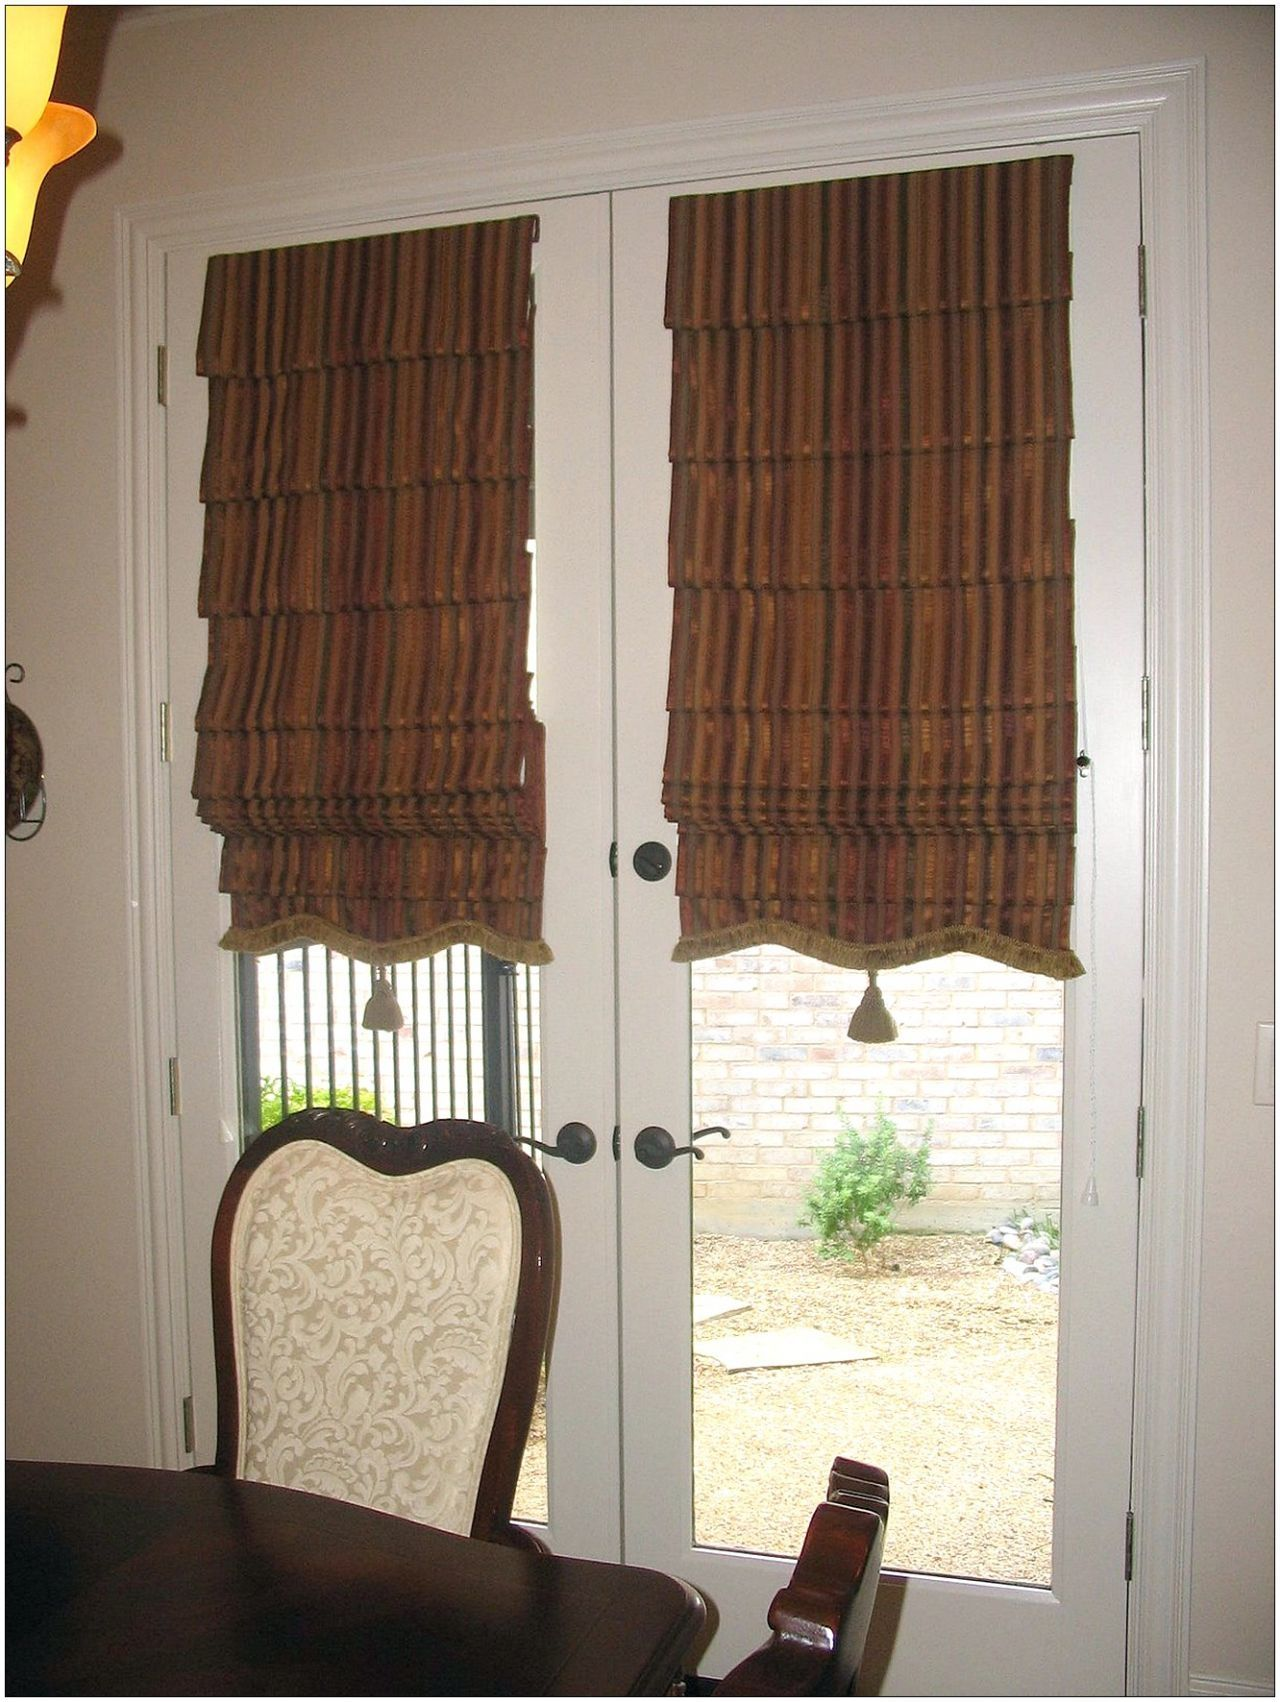 Zebra window coverings  curtains for steel door windows  realtagfo  pinterest